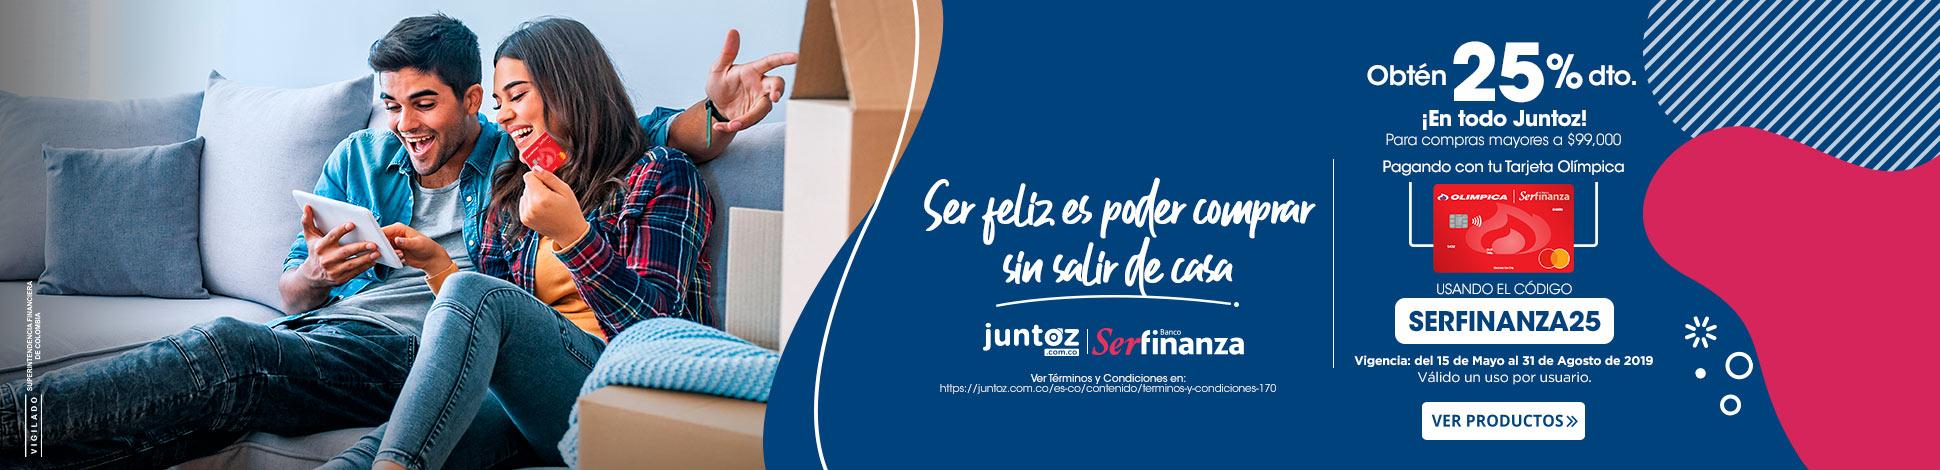 HS-SerFinanza.jpg | Juntoz.com